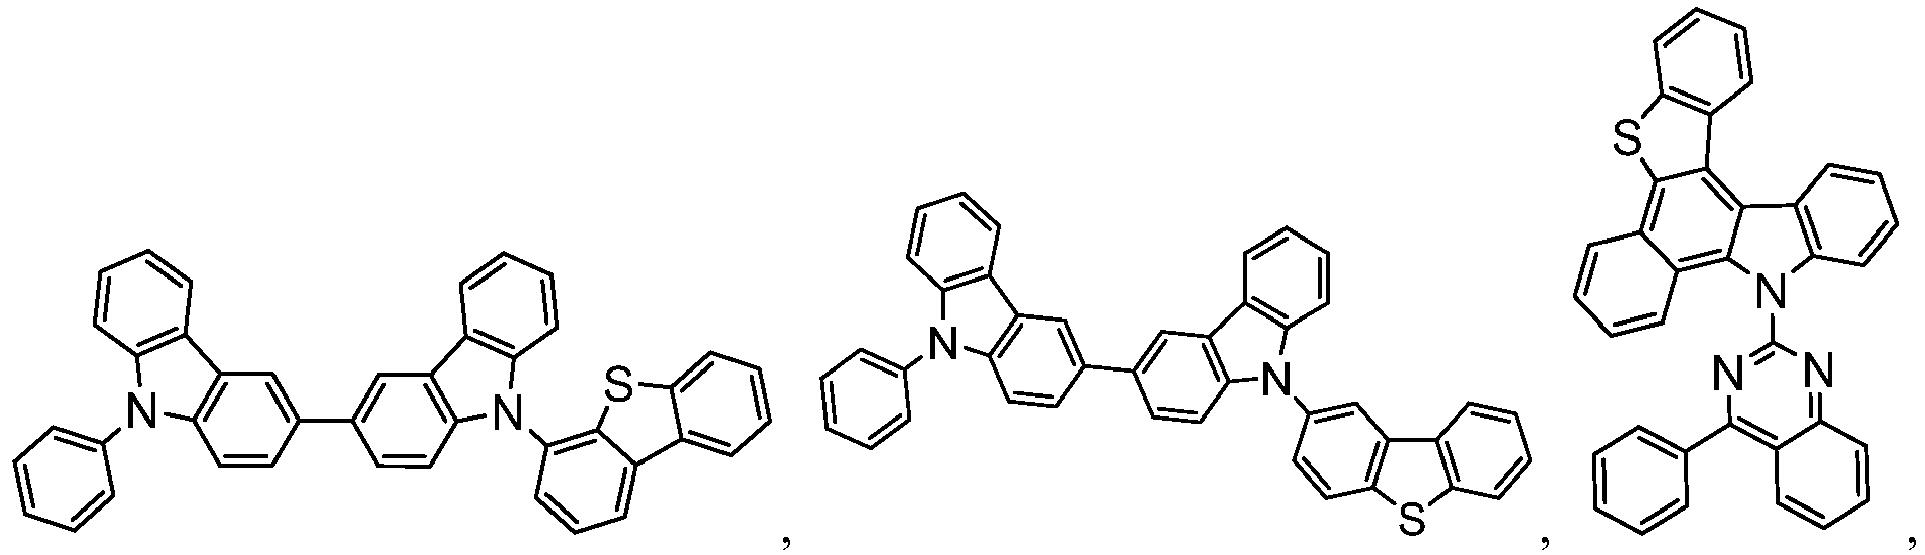 Figure imgb0983